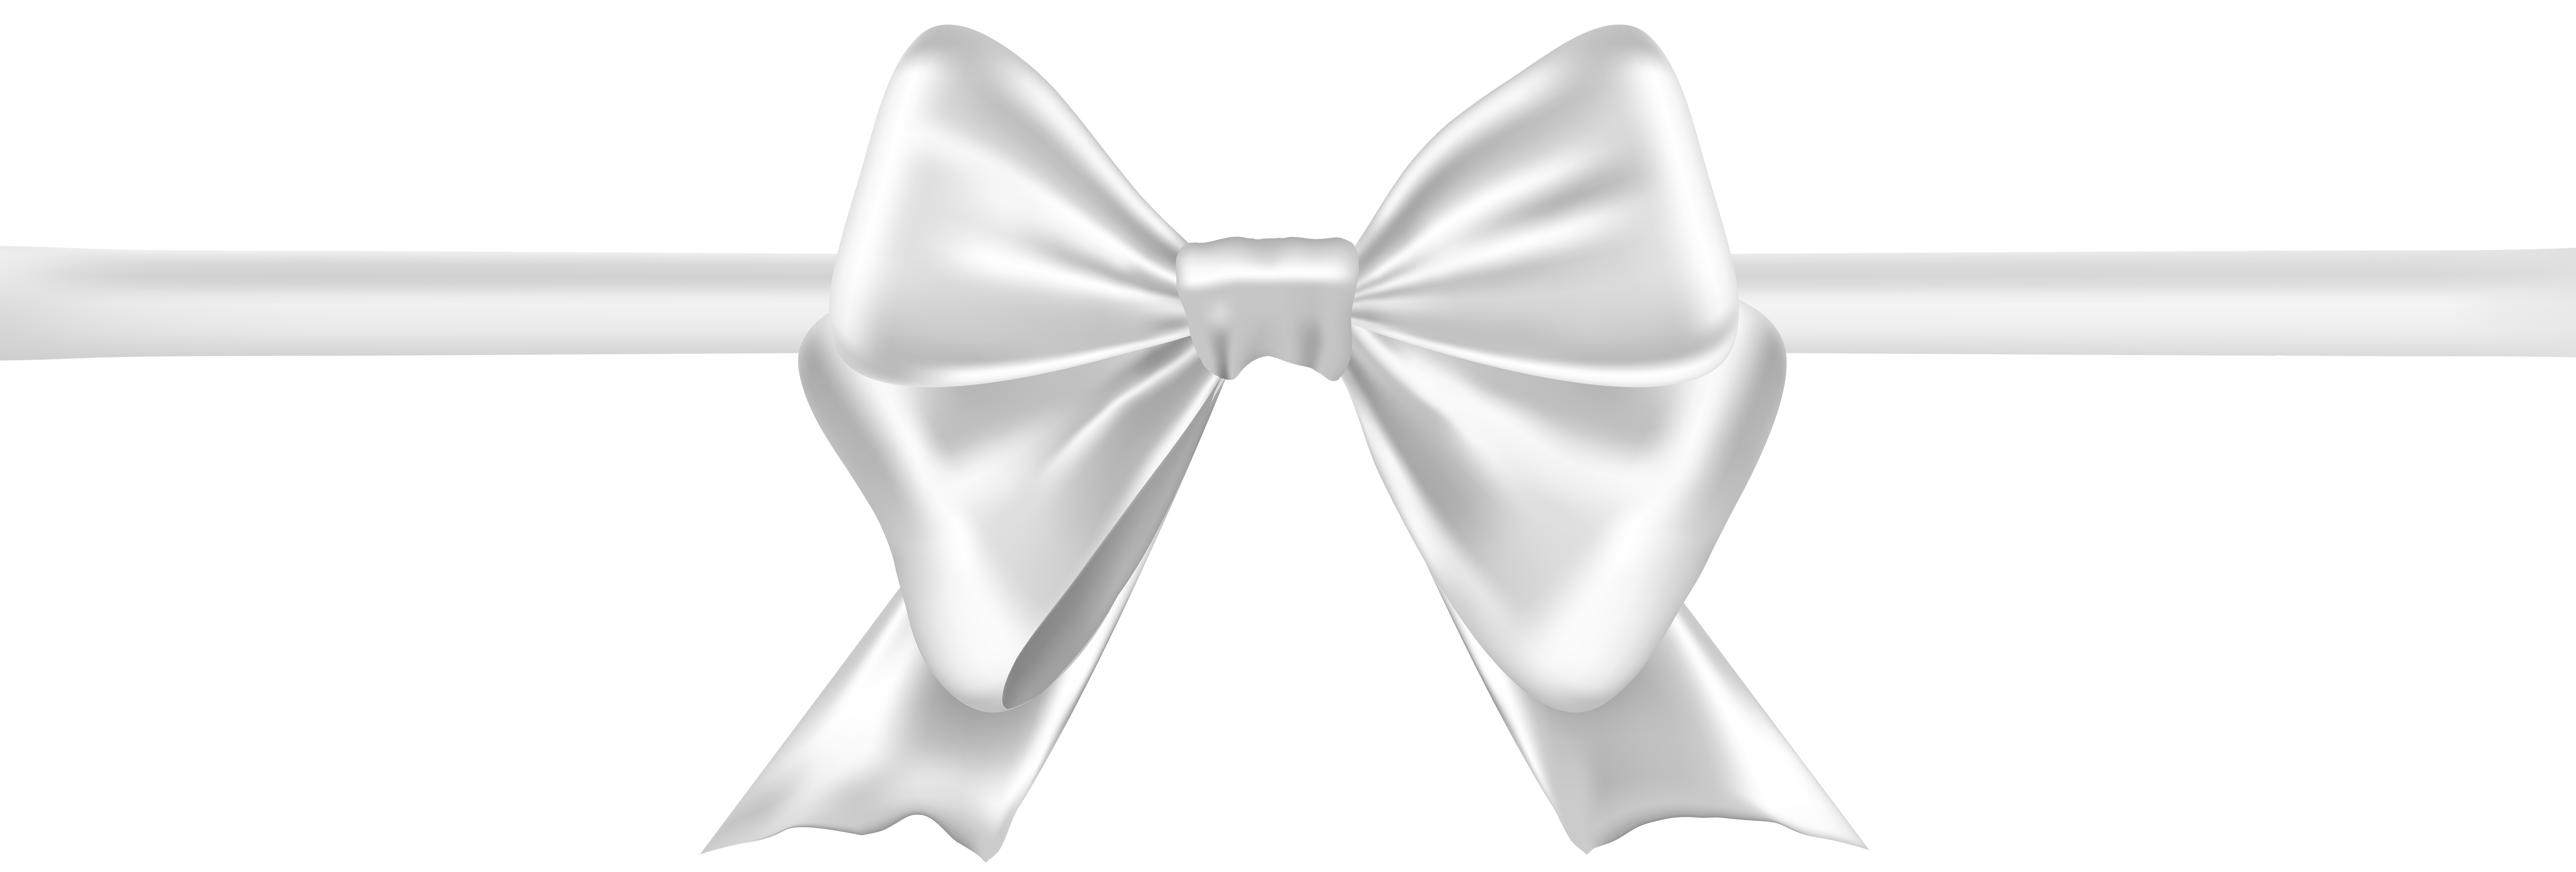 Bow White Transparent Clip Art Image.